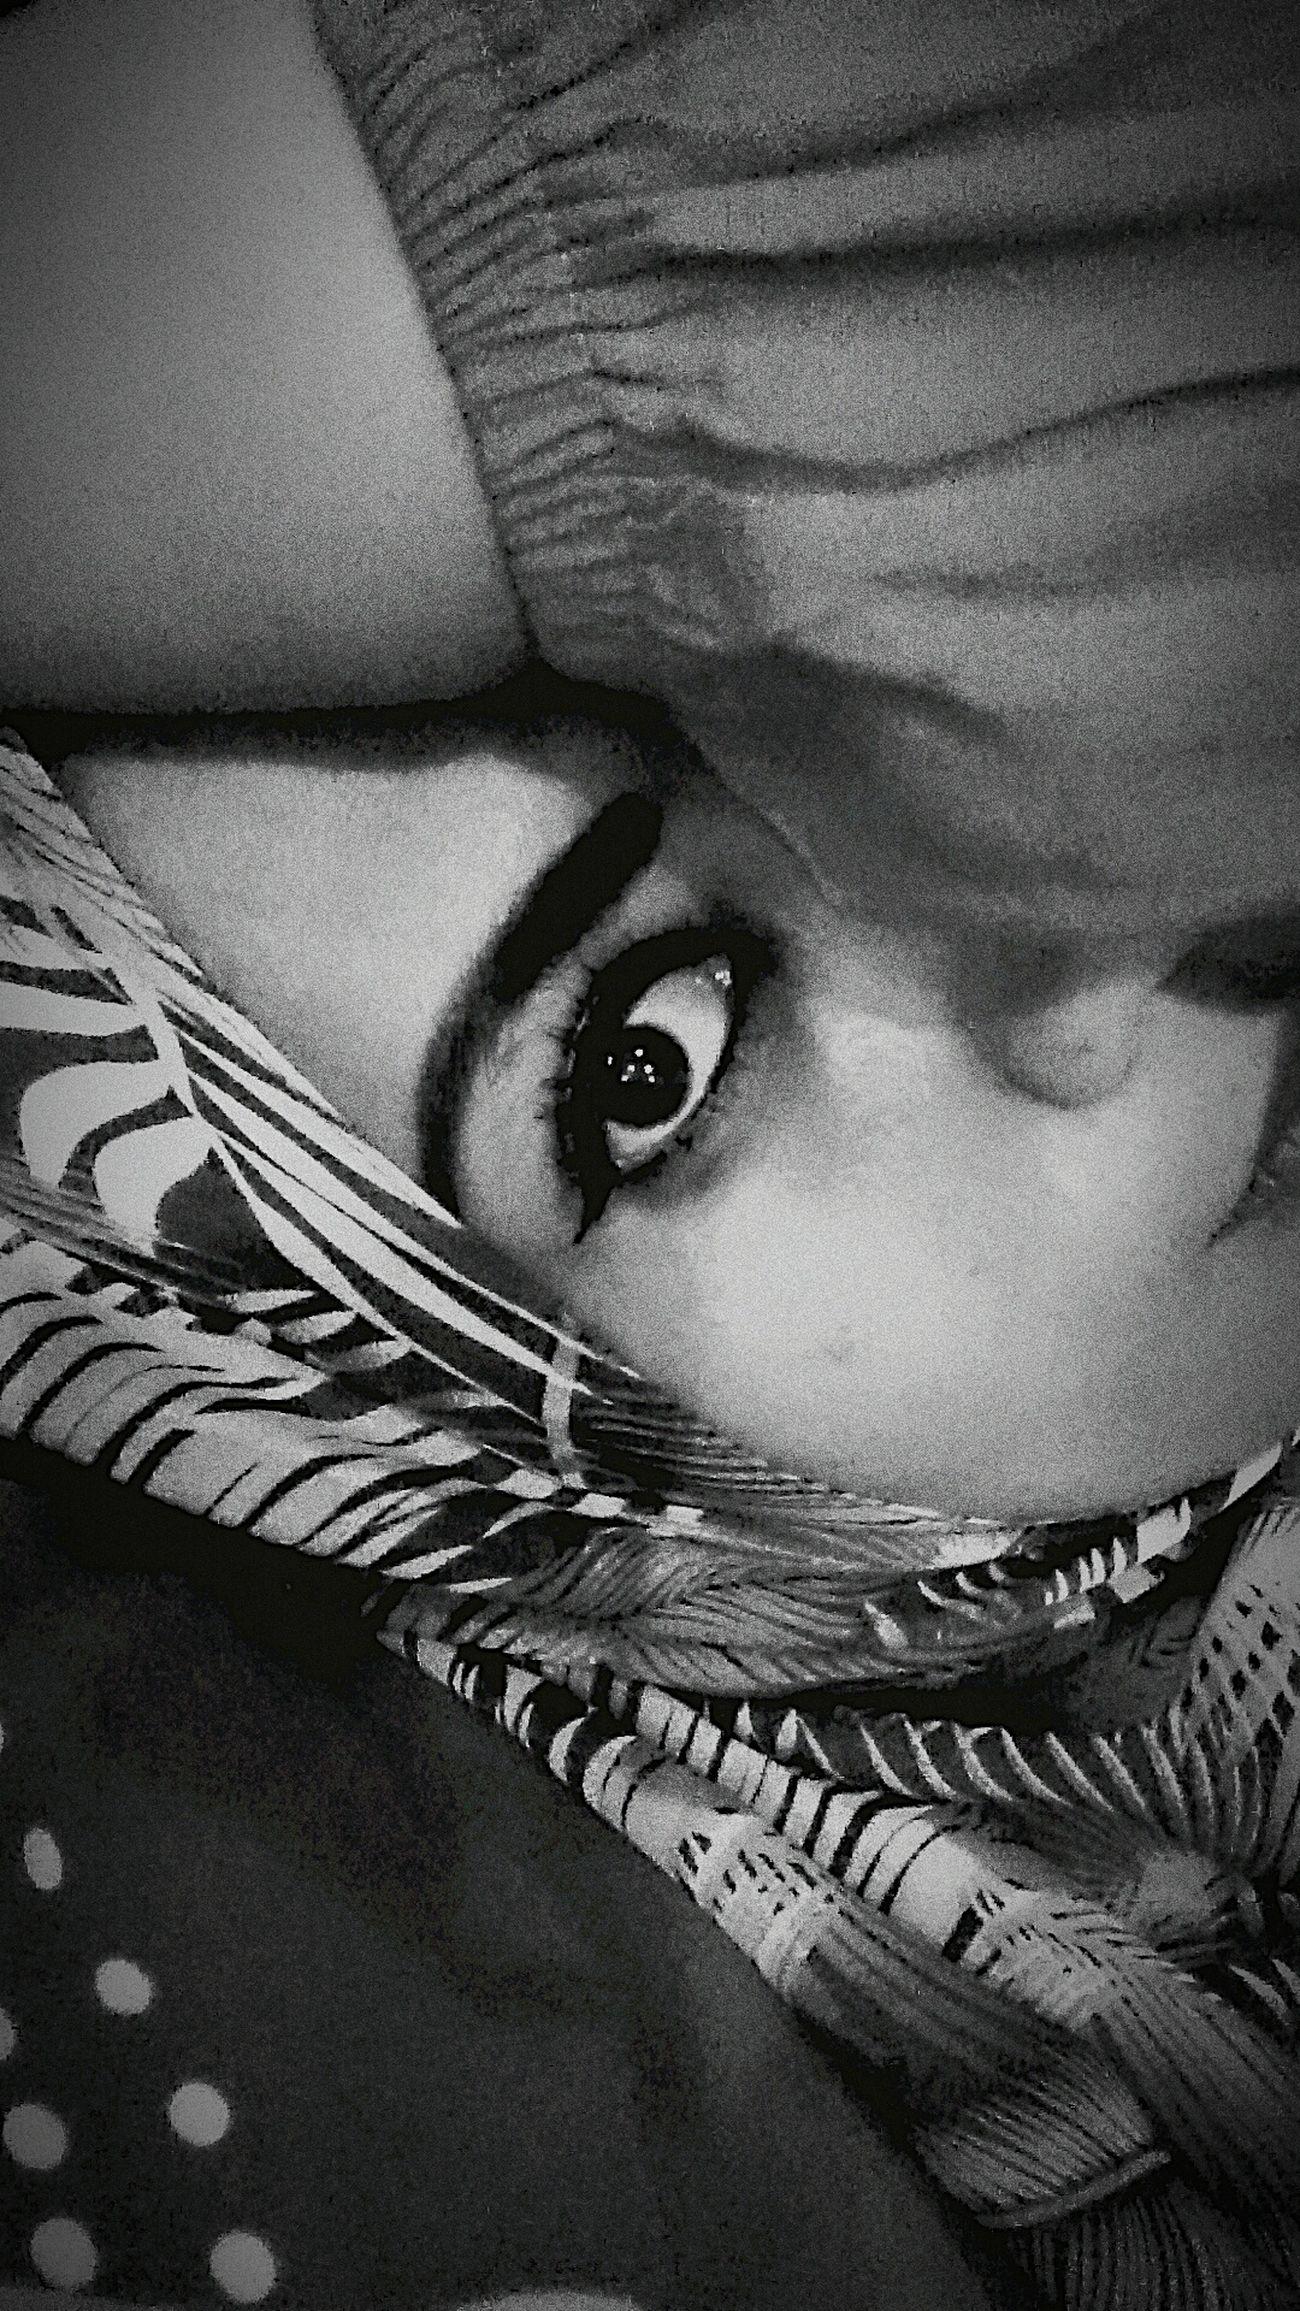 Mizz Nunuy JustMe Taking Photos Black&white Lookintomyeye Eye4photography  Makeup Smokey Eyes Just Me Myself And I  Hello World